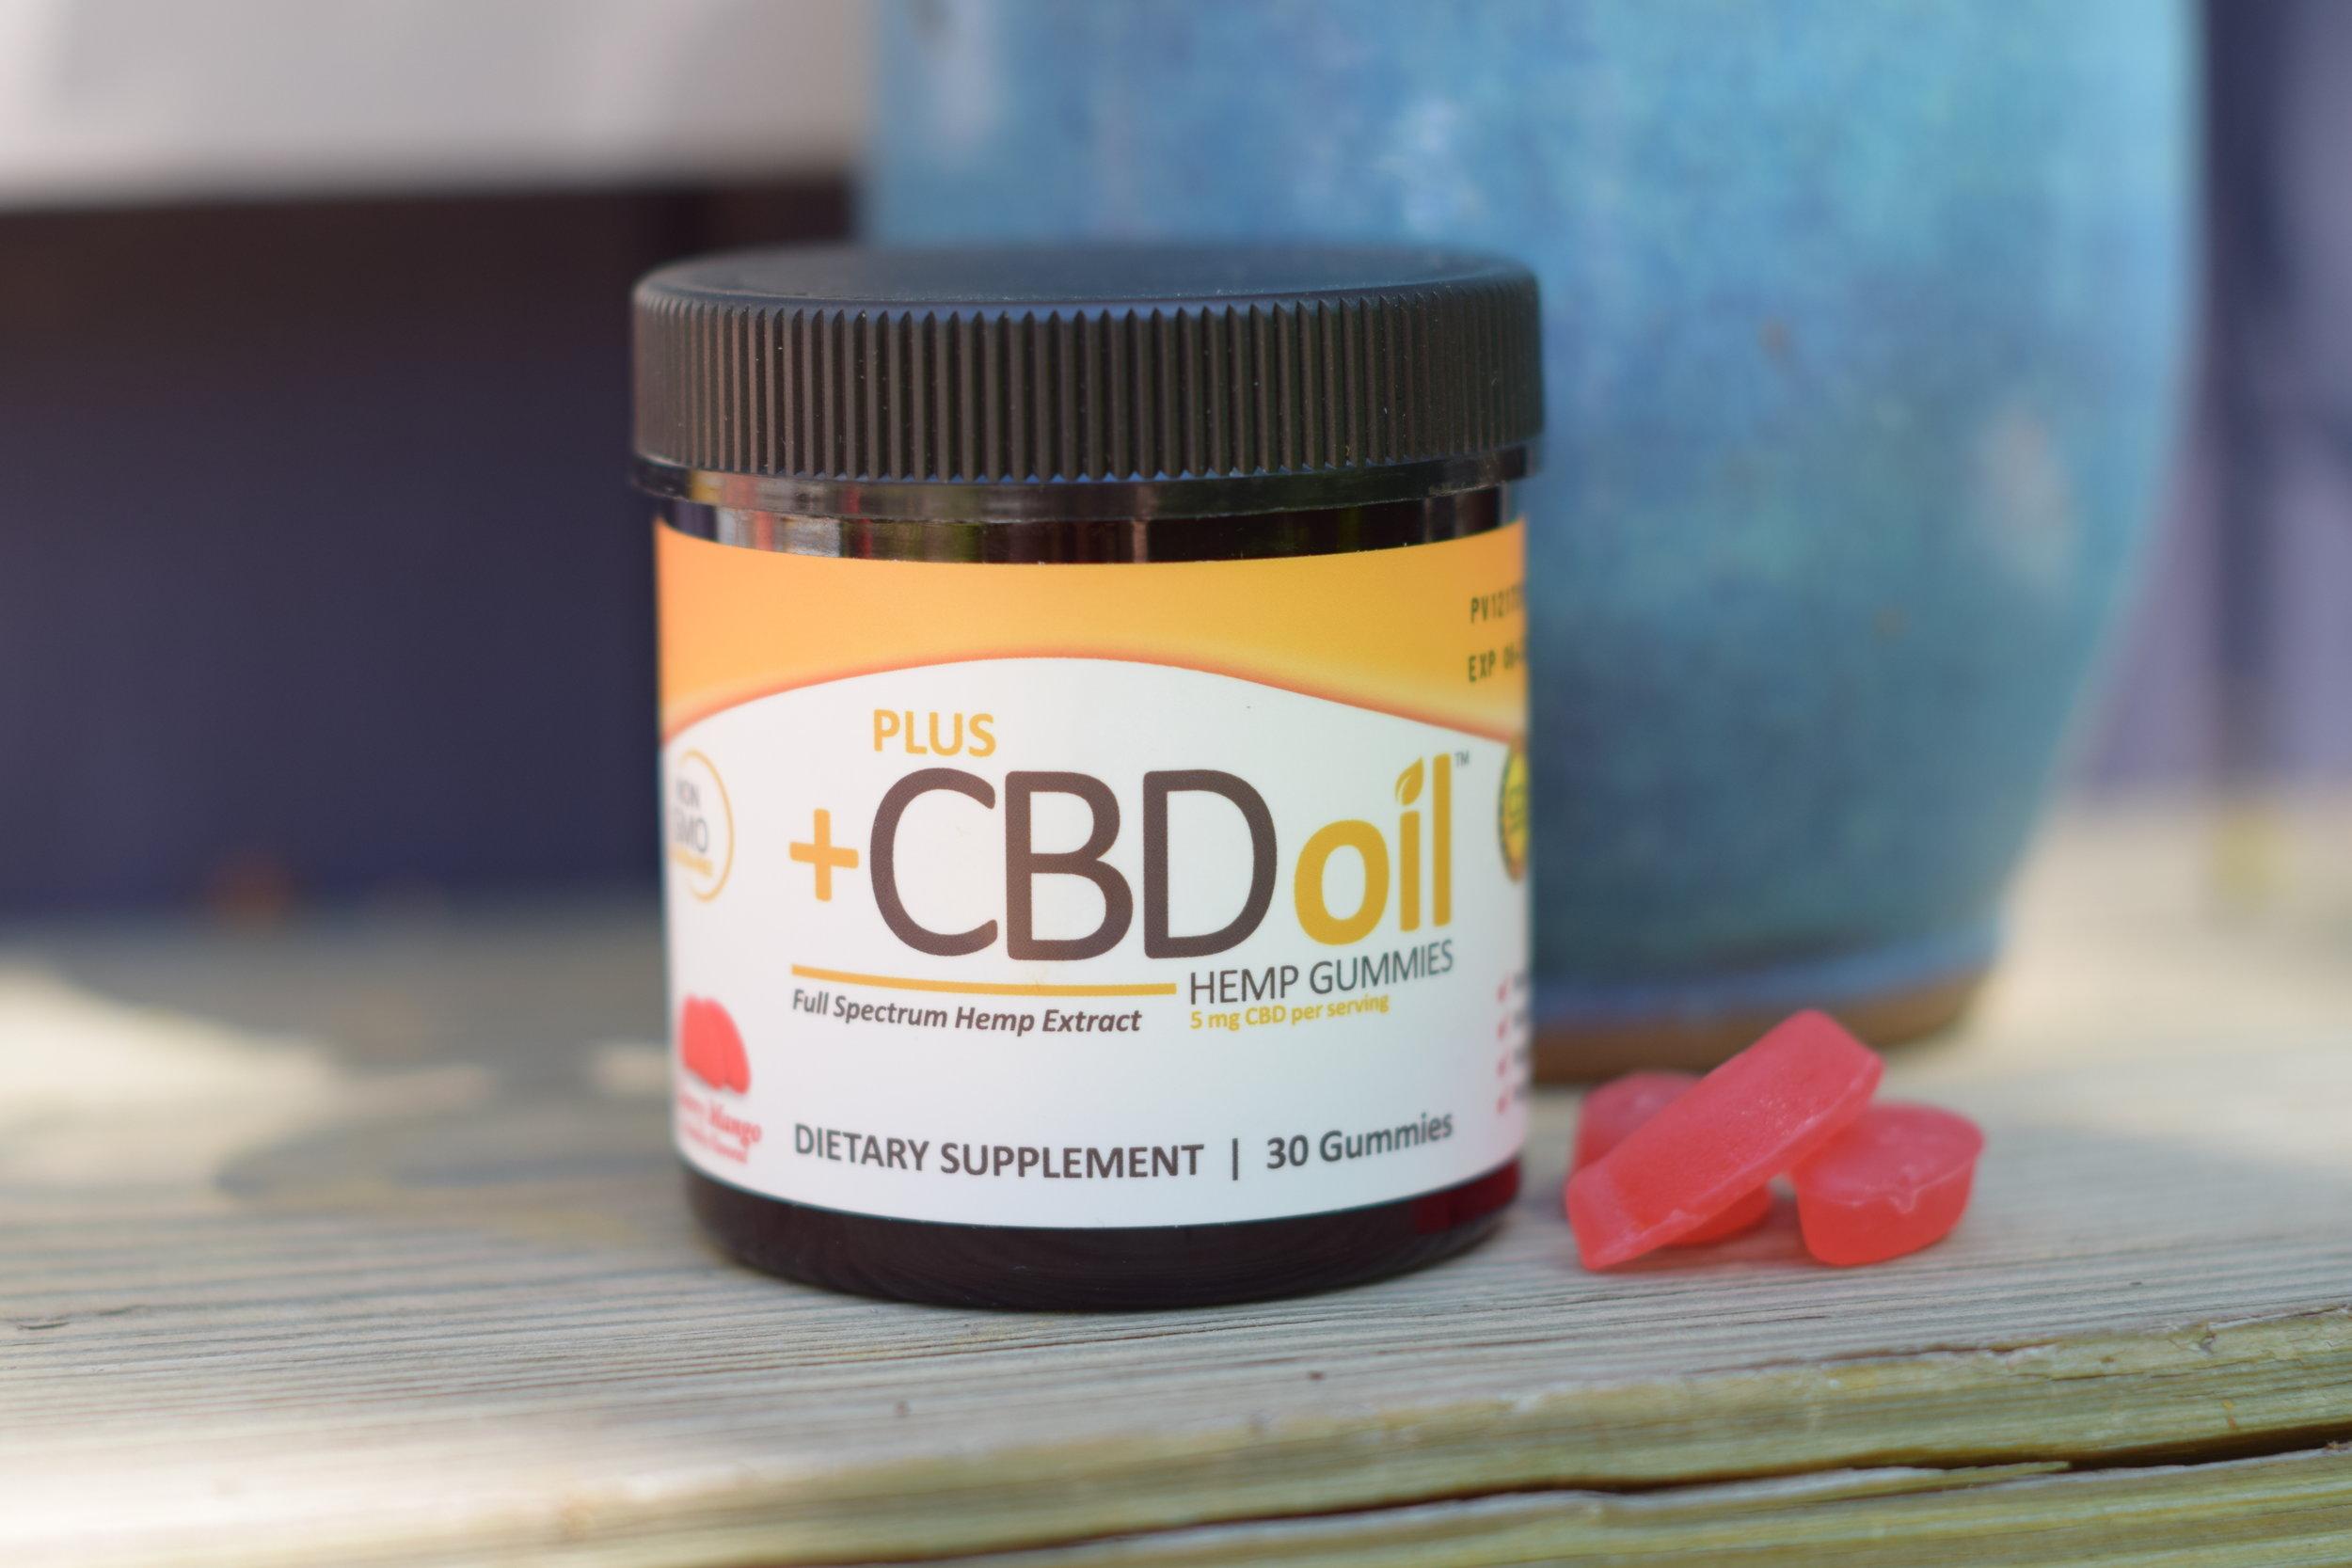 Plus +CBD Oil by CV Sciences in Gummies, Softgels, Tincture